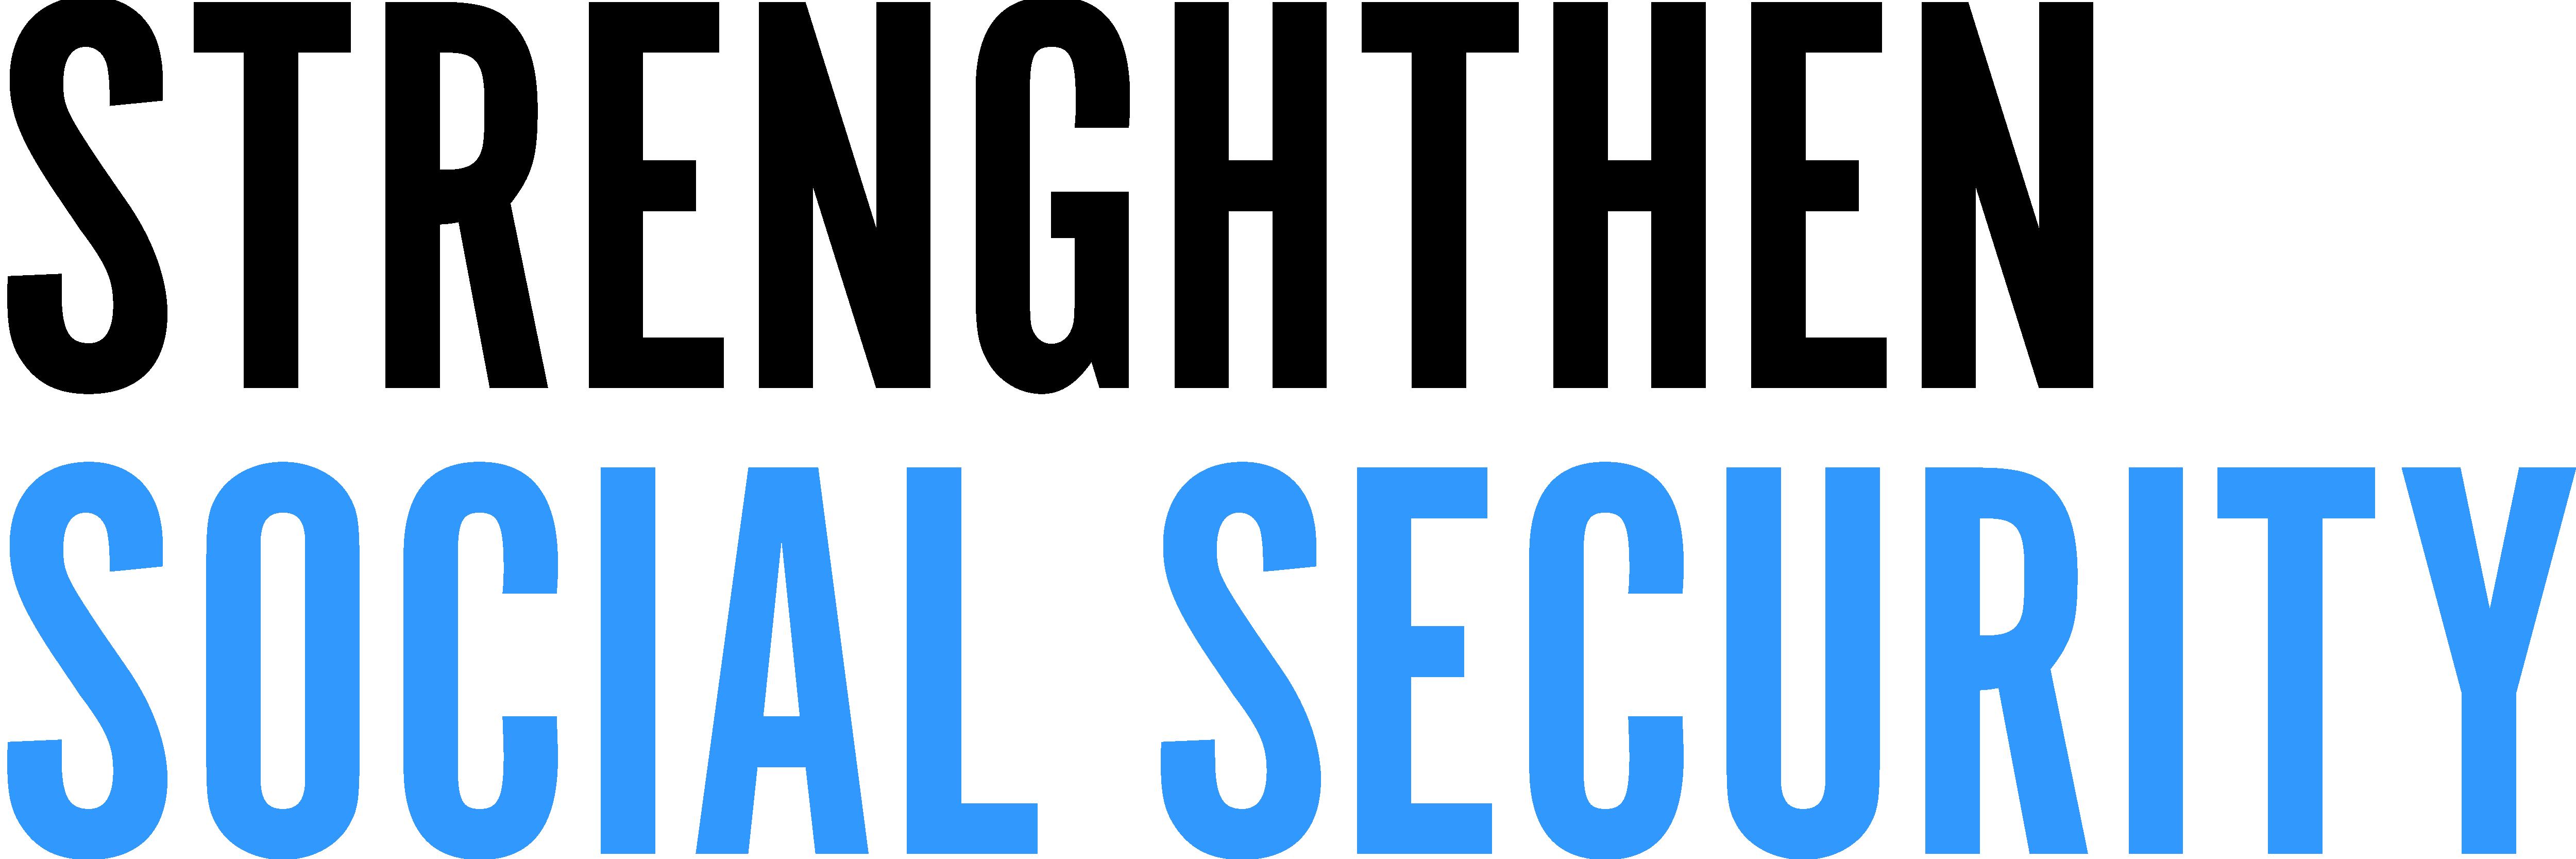 Strengthen Social Security